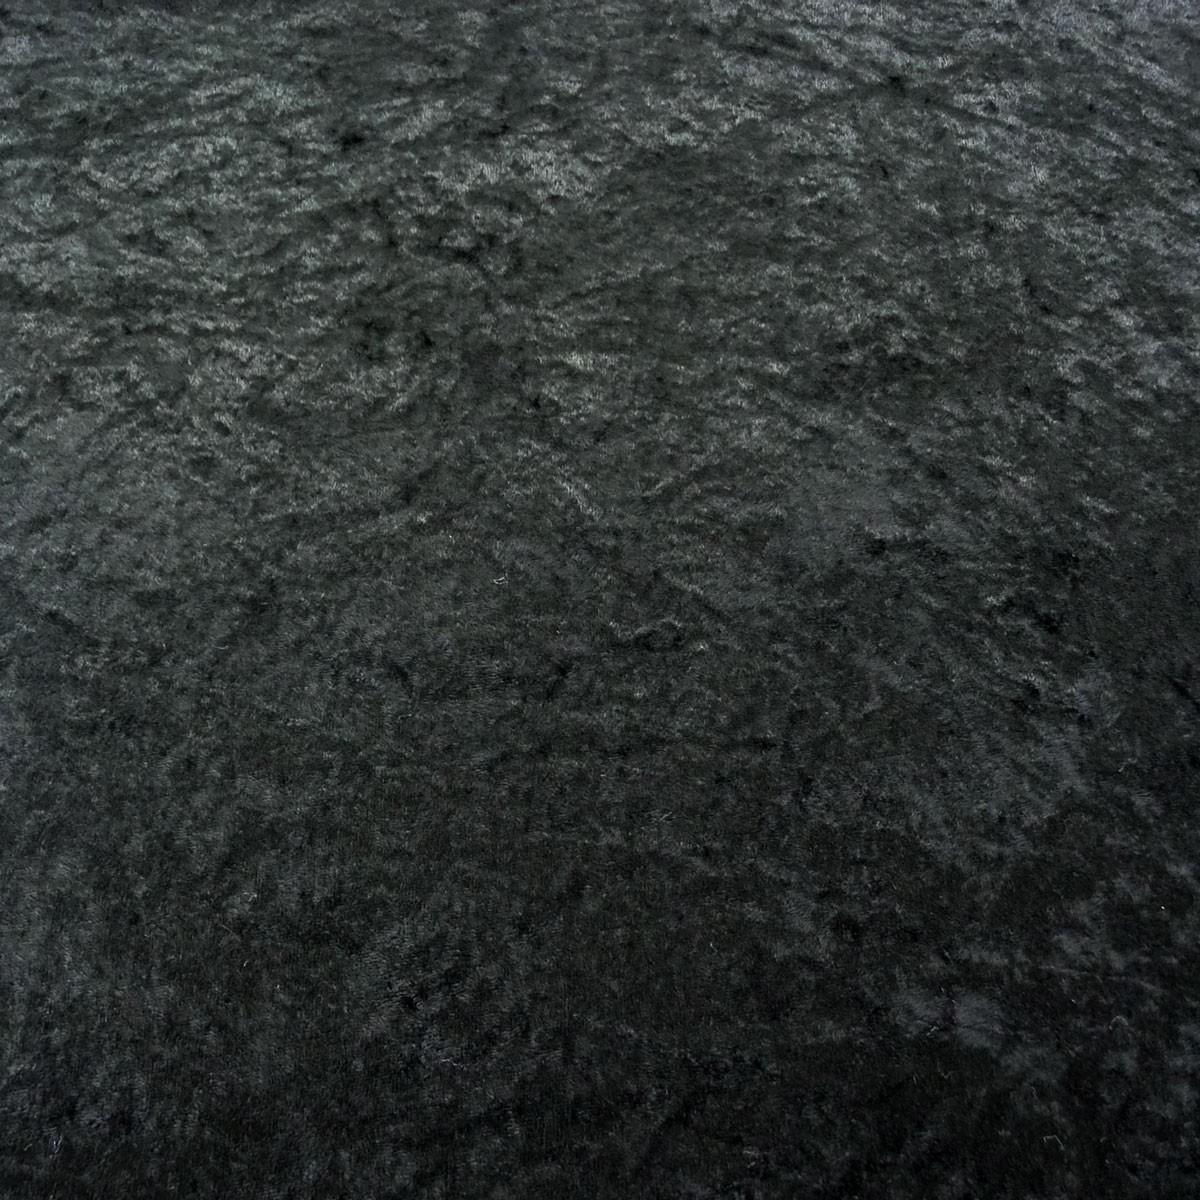 samtstoff kreativstoff pannesamt einfarbig schwarz 1 5m stoffe stoffe uni. Black Bedroom Furniture Sets. Home Design Ideas